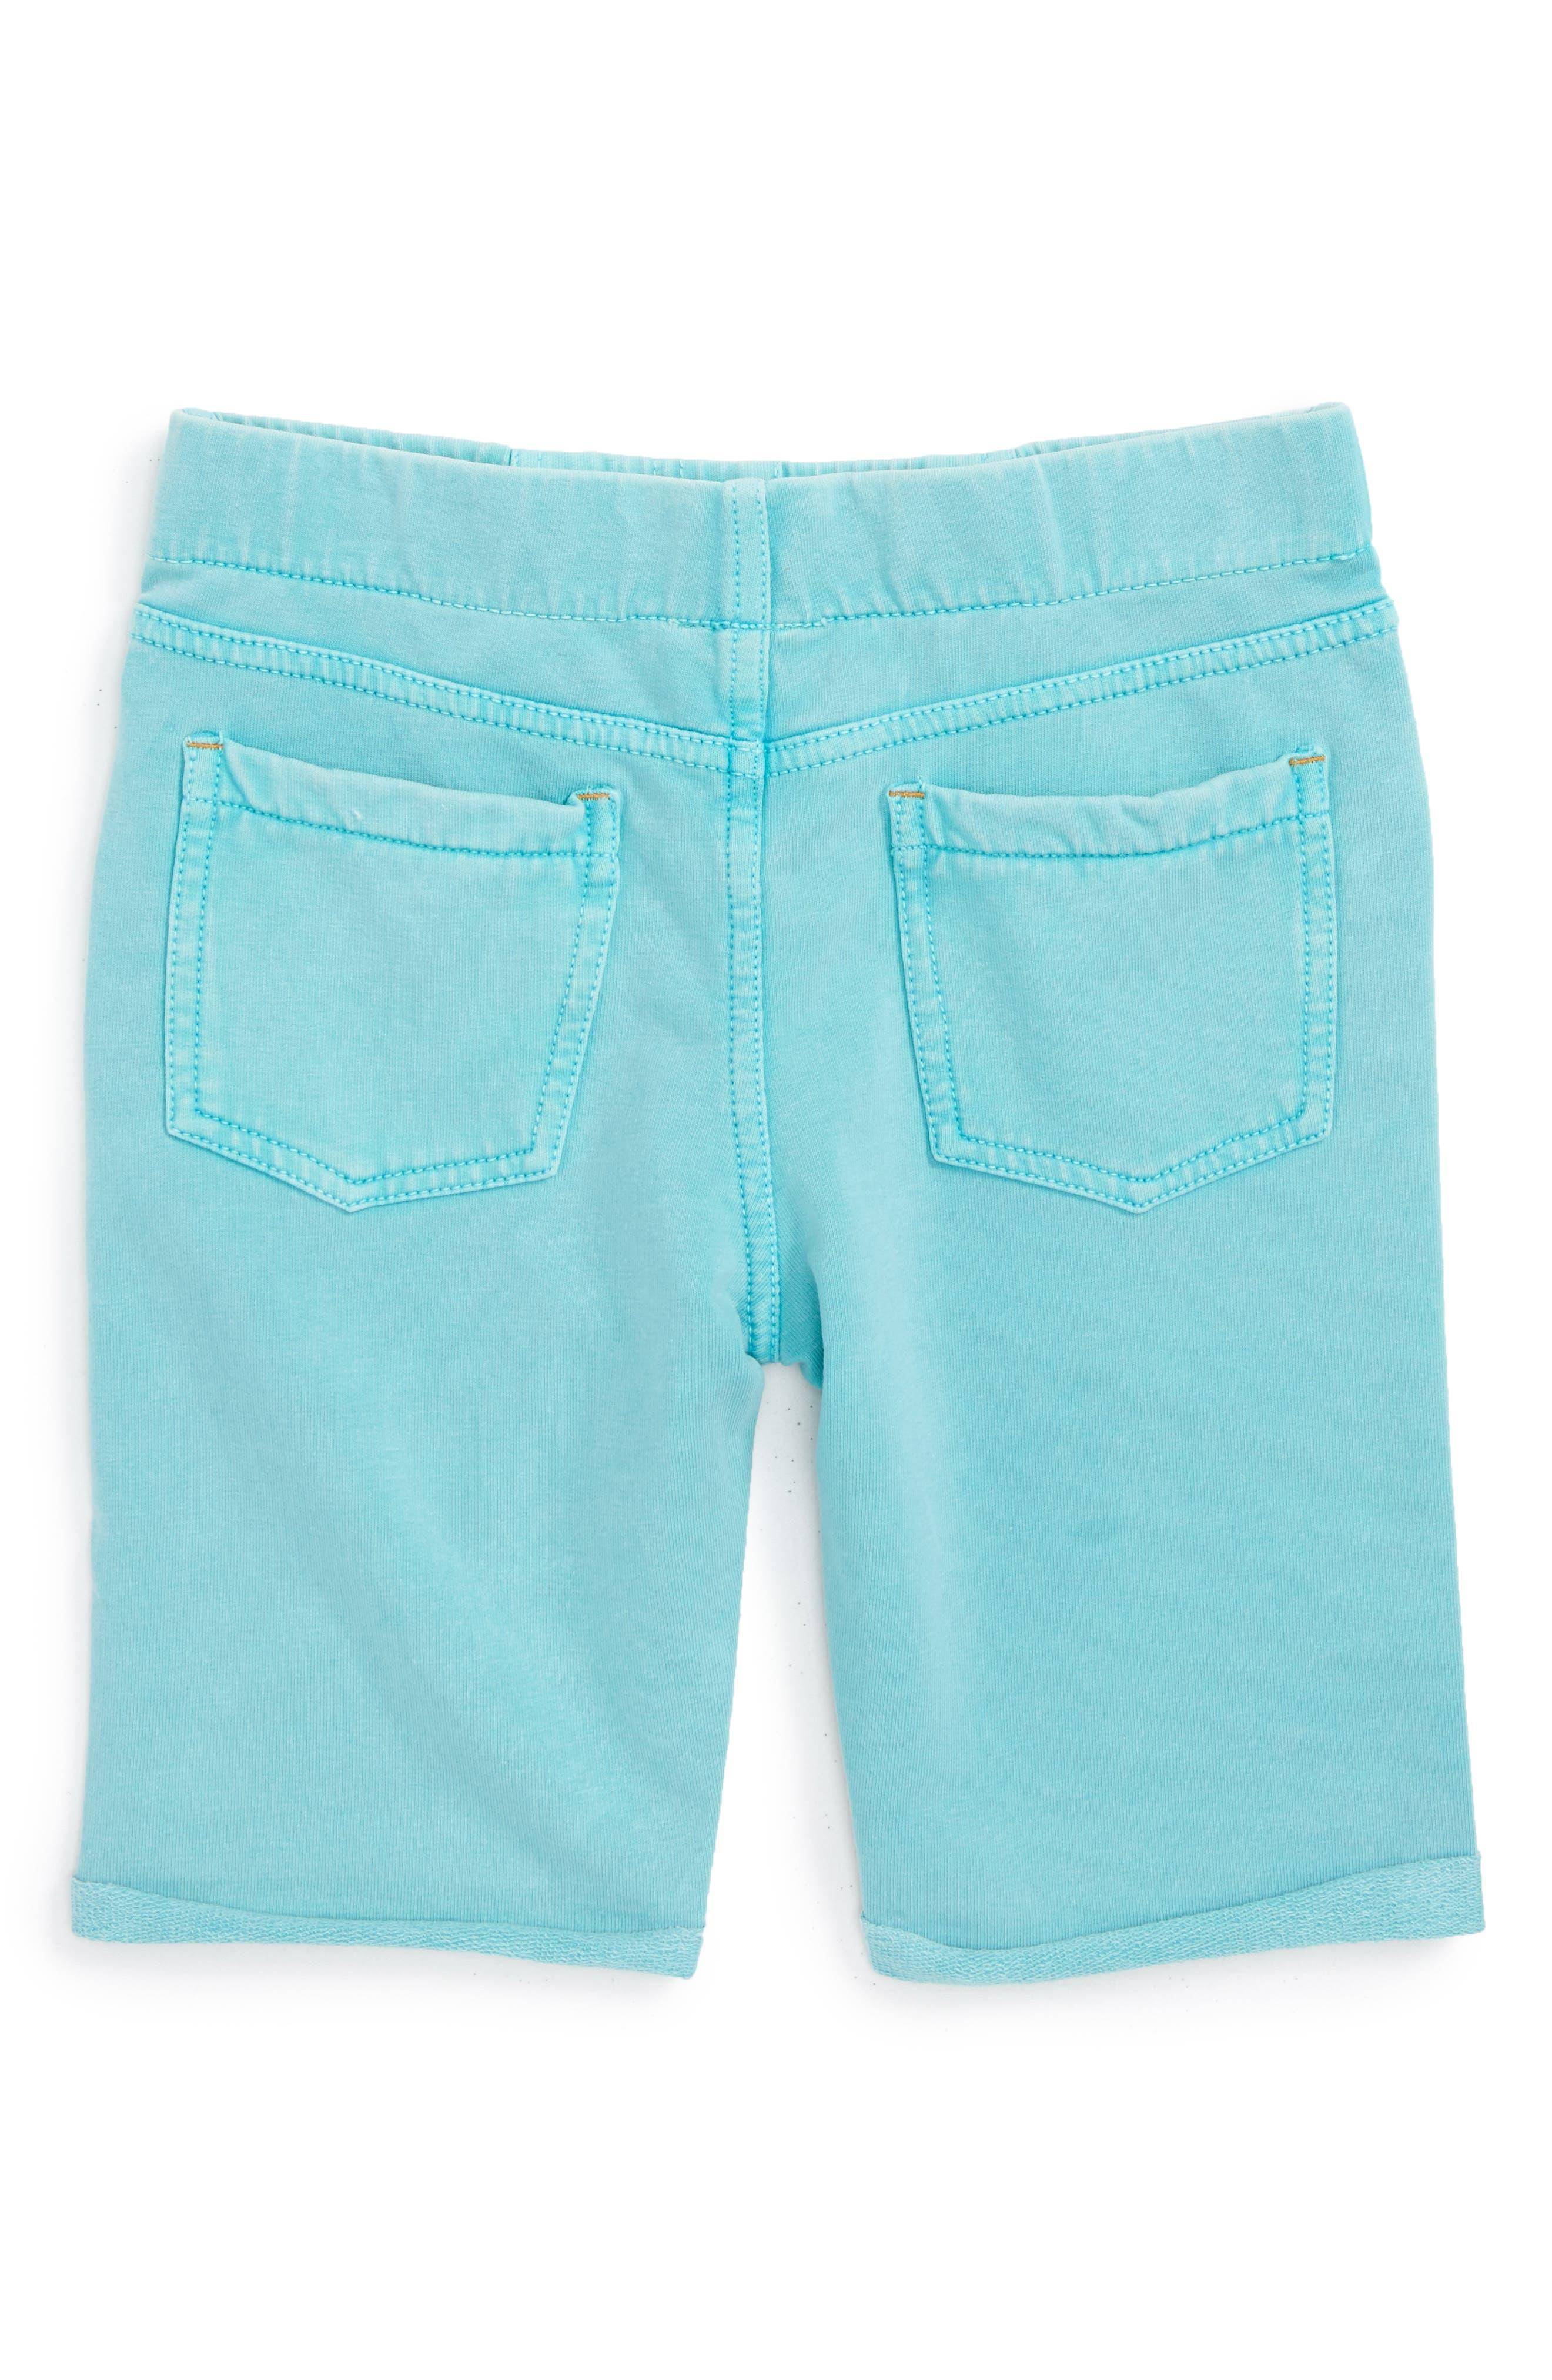 'Jenna' Jegging Shorts,                             Main thumbnail 7, color,